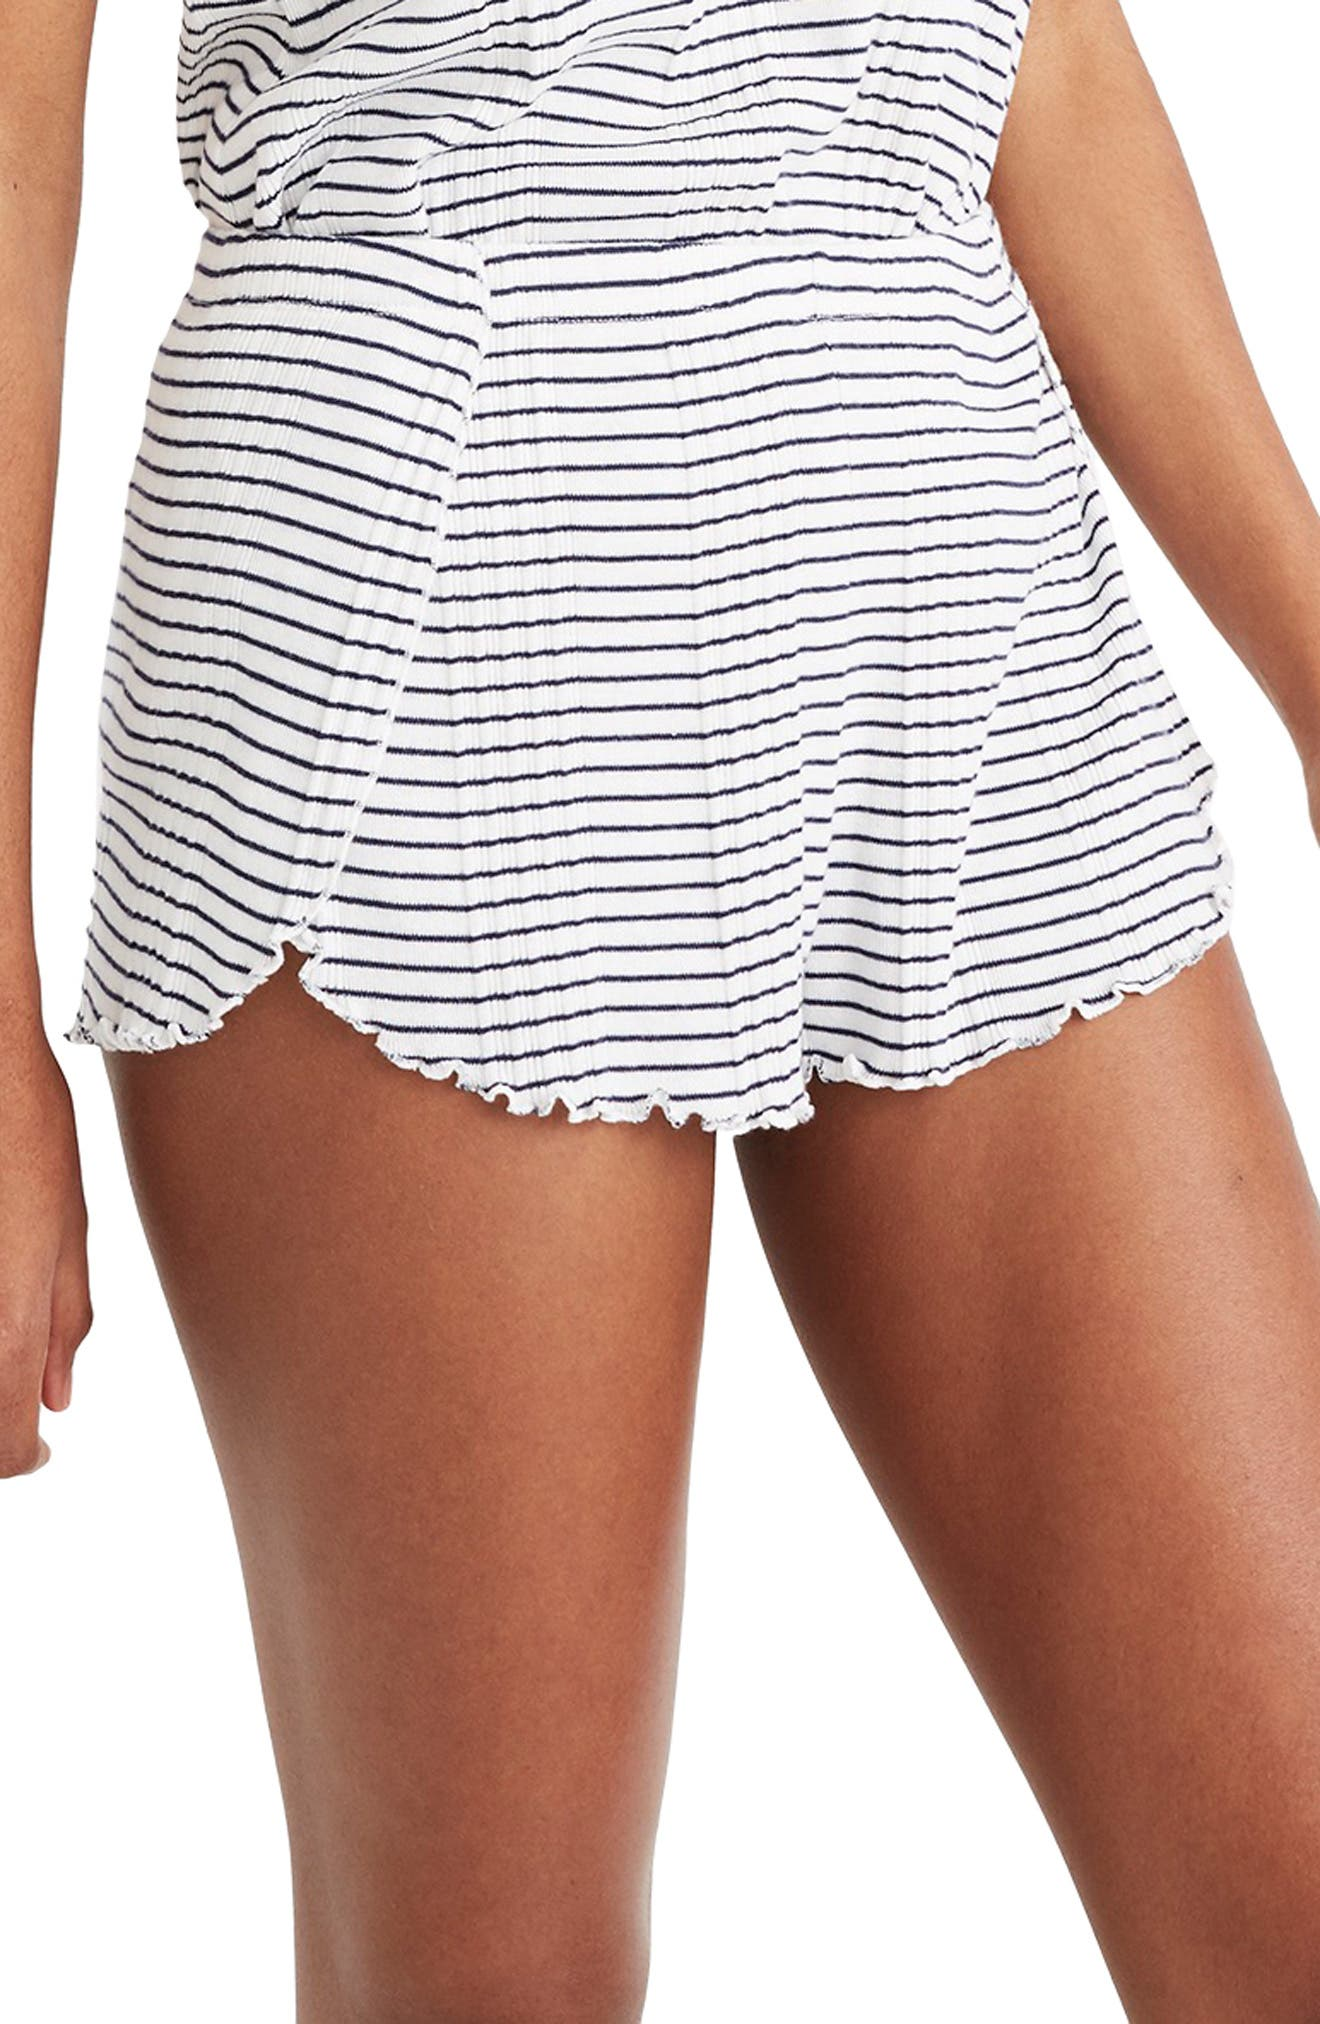 Madewell Stripe Rib Pajama Shorts, Ivory